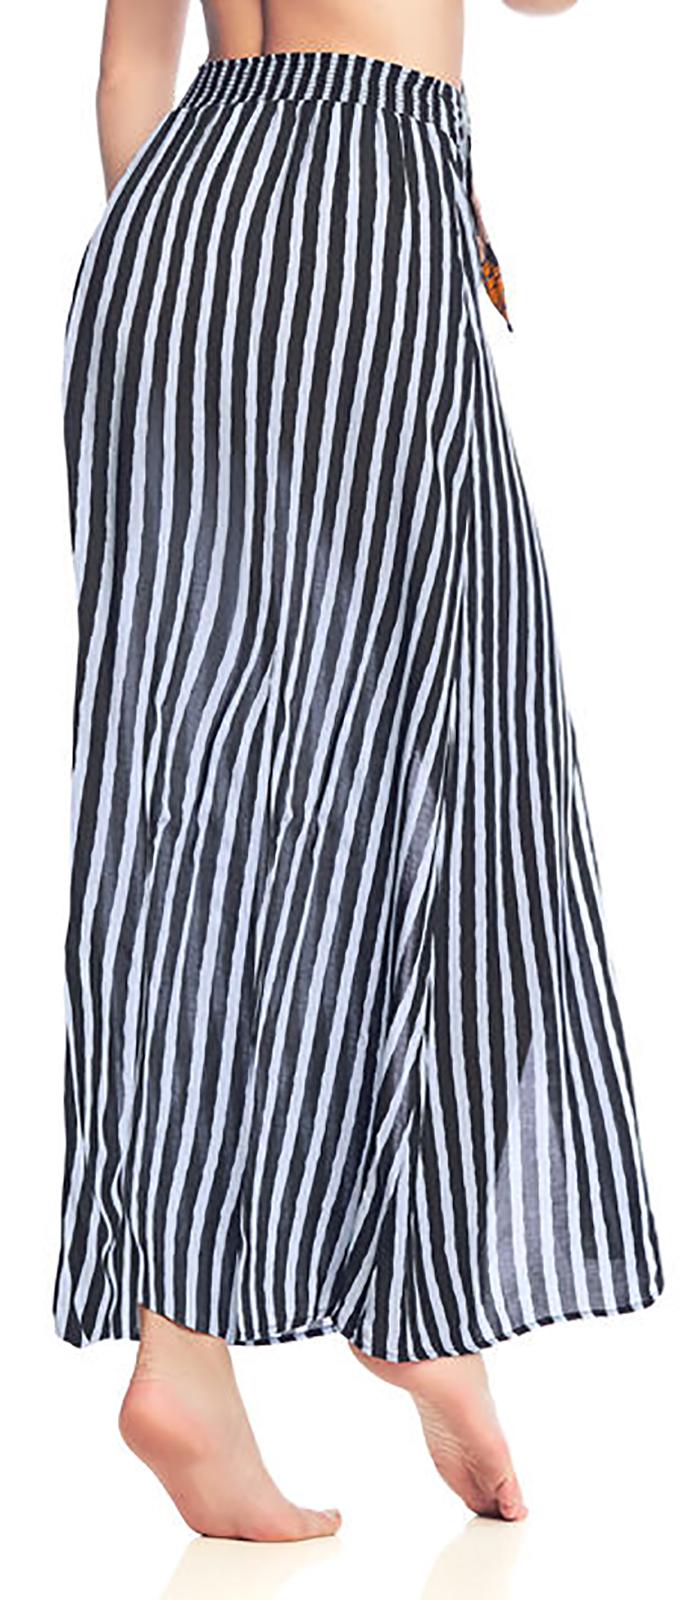 3b909059a7 Skirt Long Beach Dress In Straps - Experience Everyday - Brand Maaji